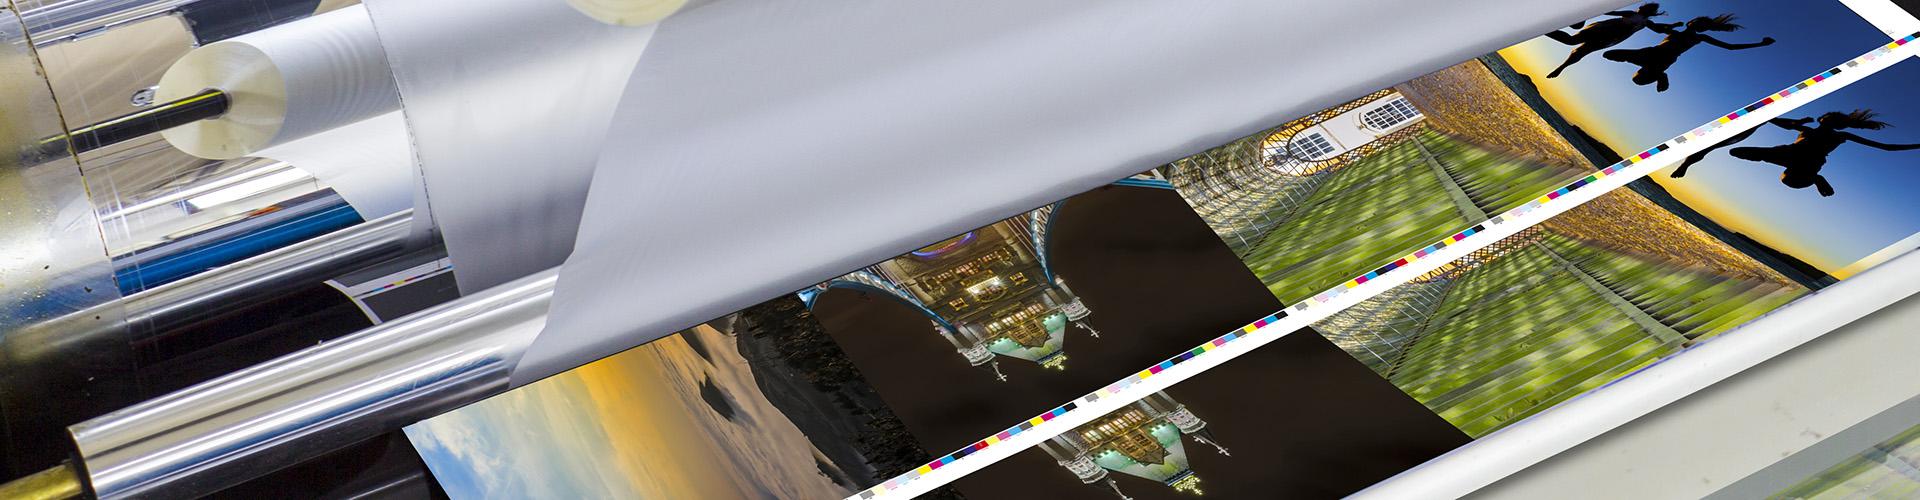 Baobab-Printing-Slide-Background-Image-1